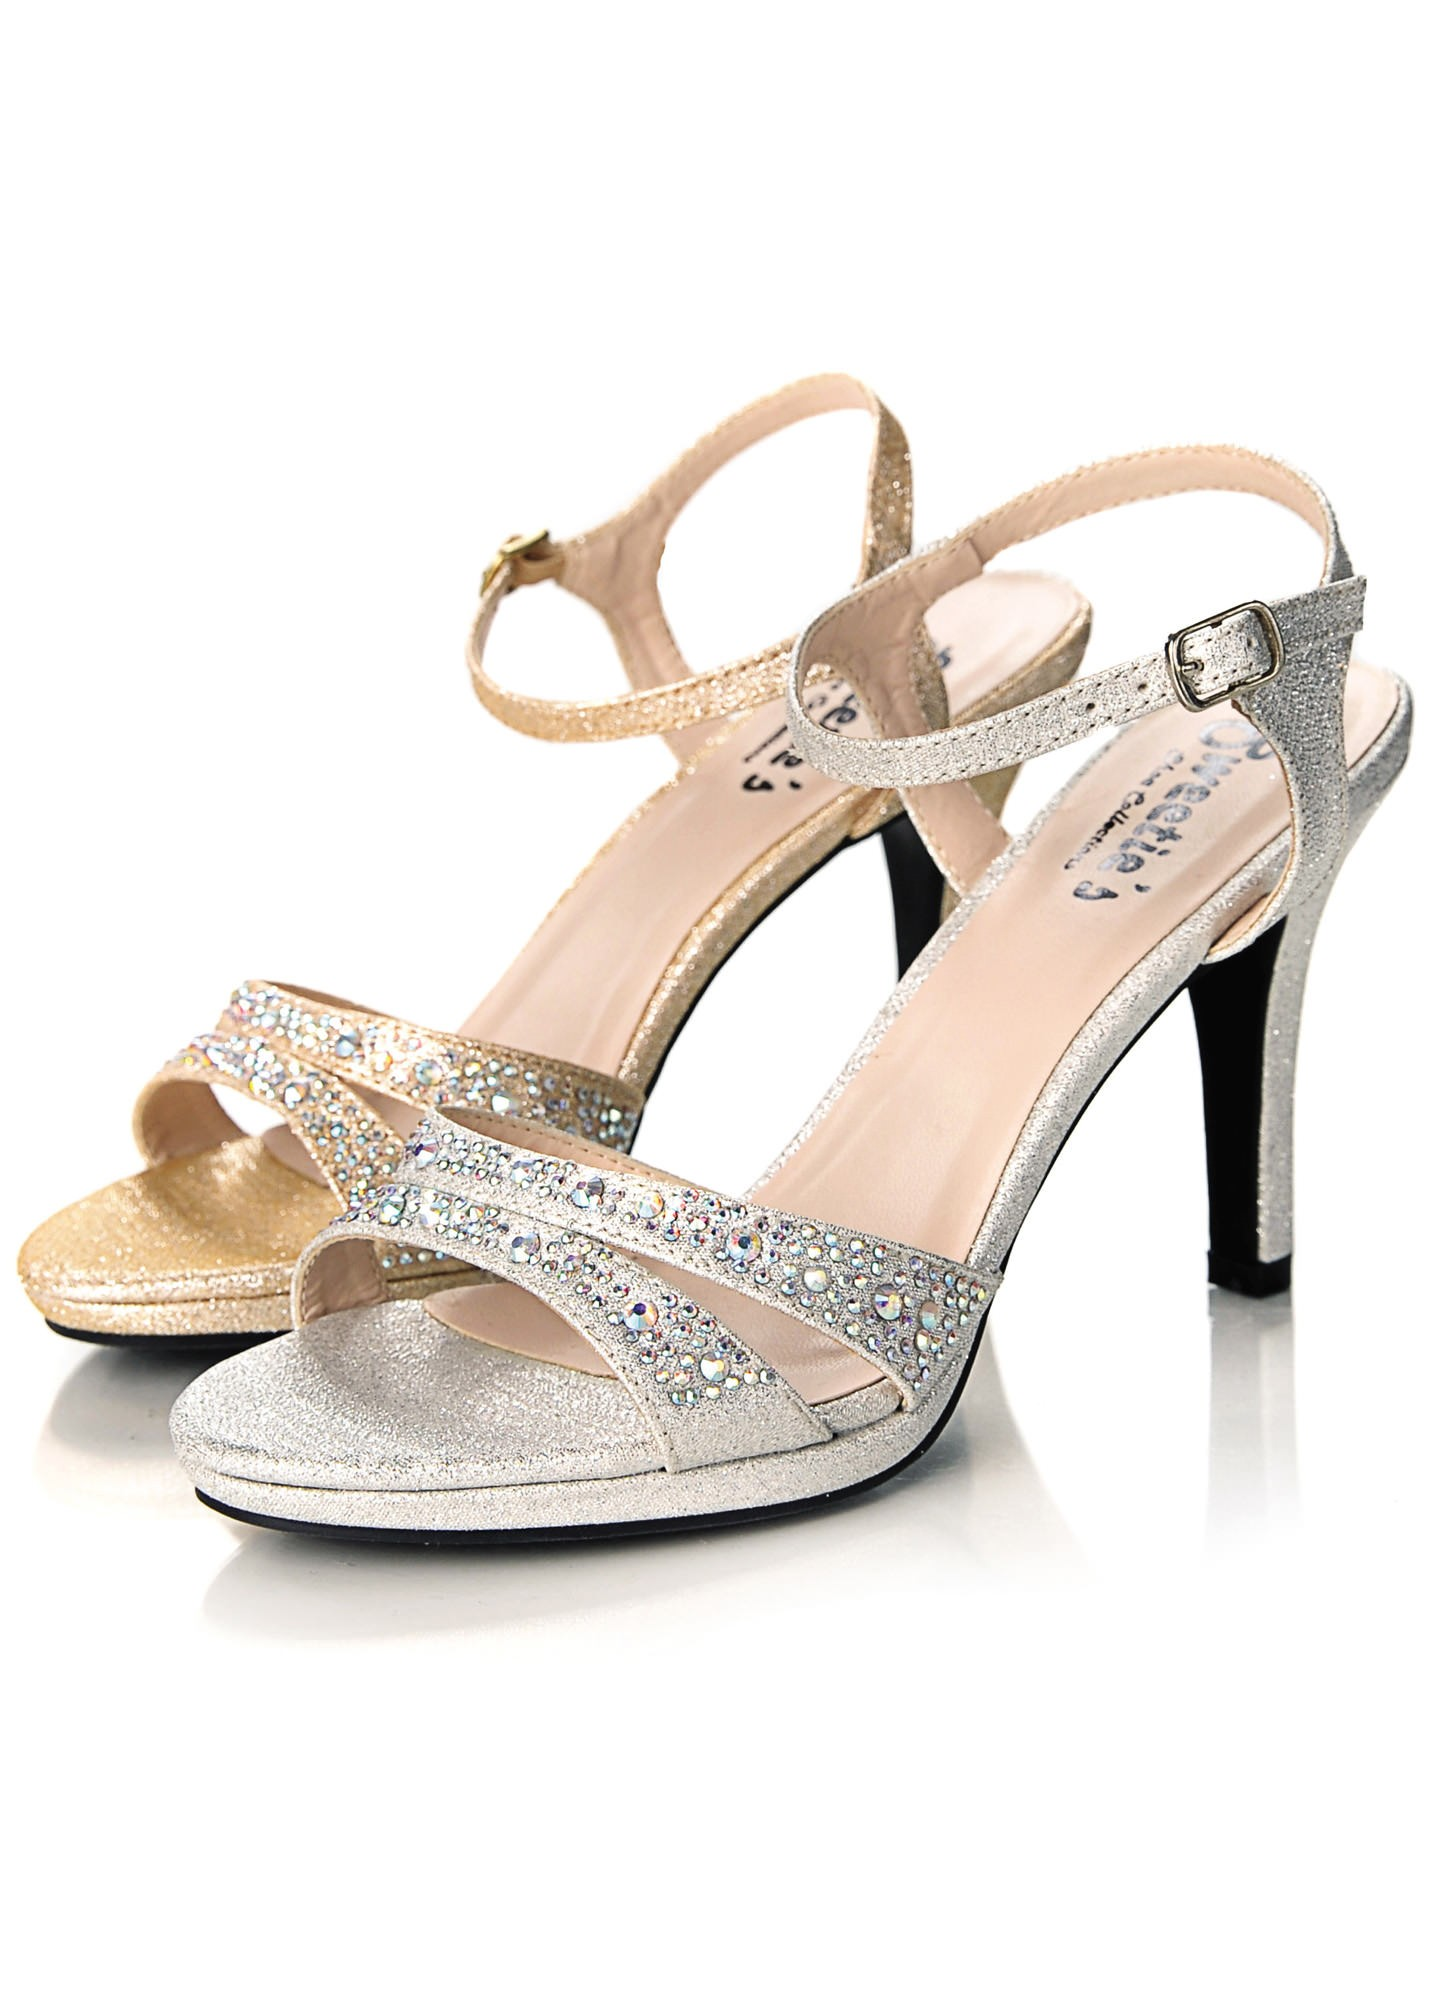 Sweetie's Sylvia Jeweled Peep Toe Shoes